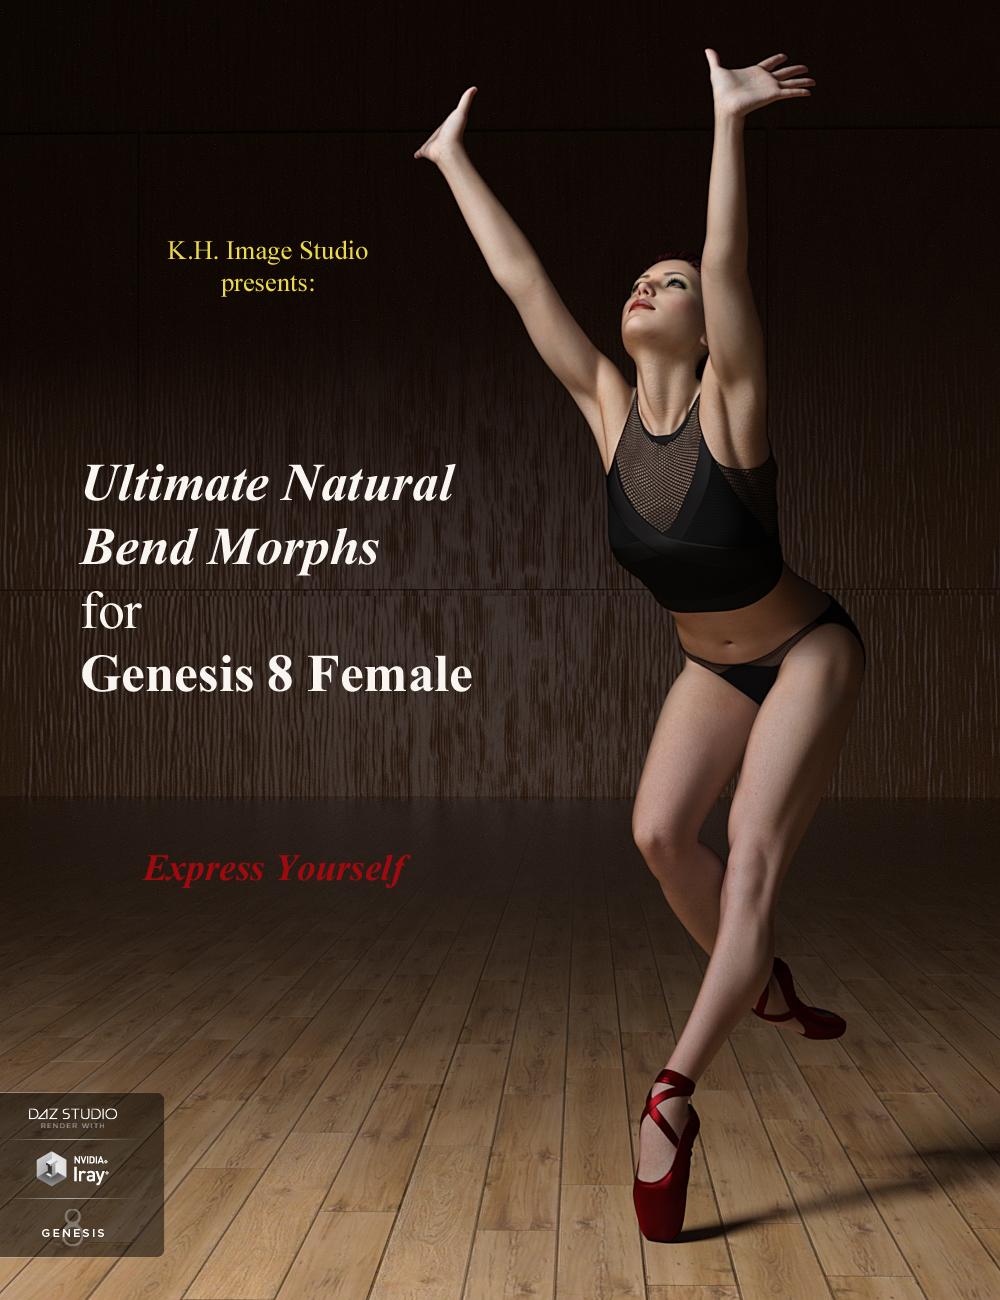 Ultimate Natural Bend Morphs for Genesis 8 Female by: K.H. Image Studio, 3D Models by Daz 3D